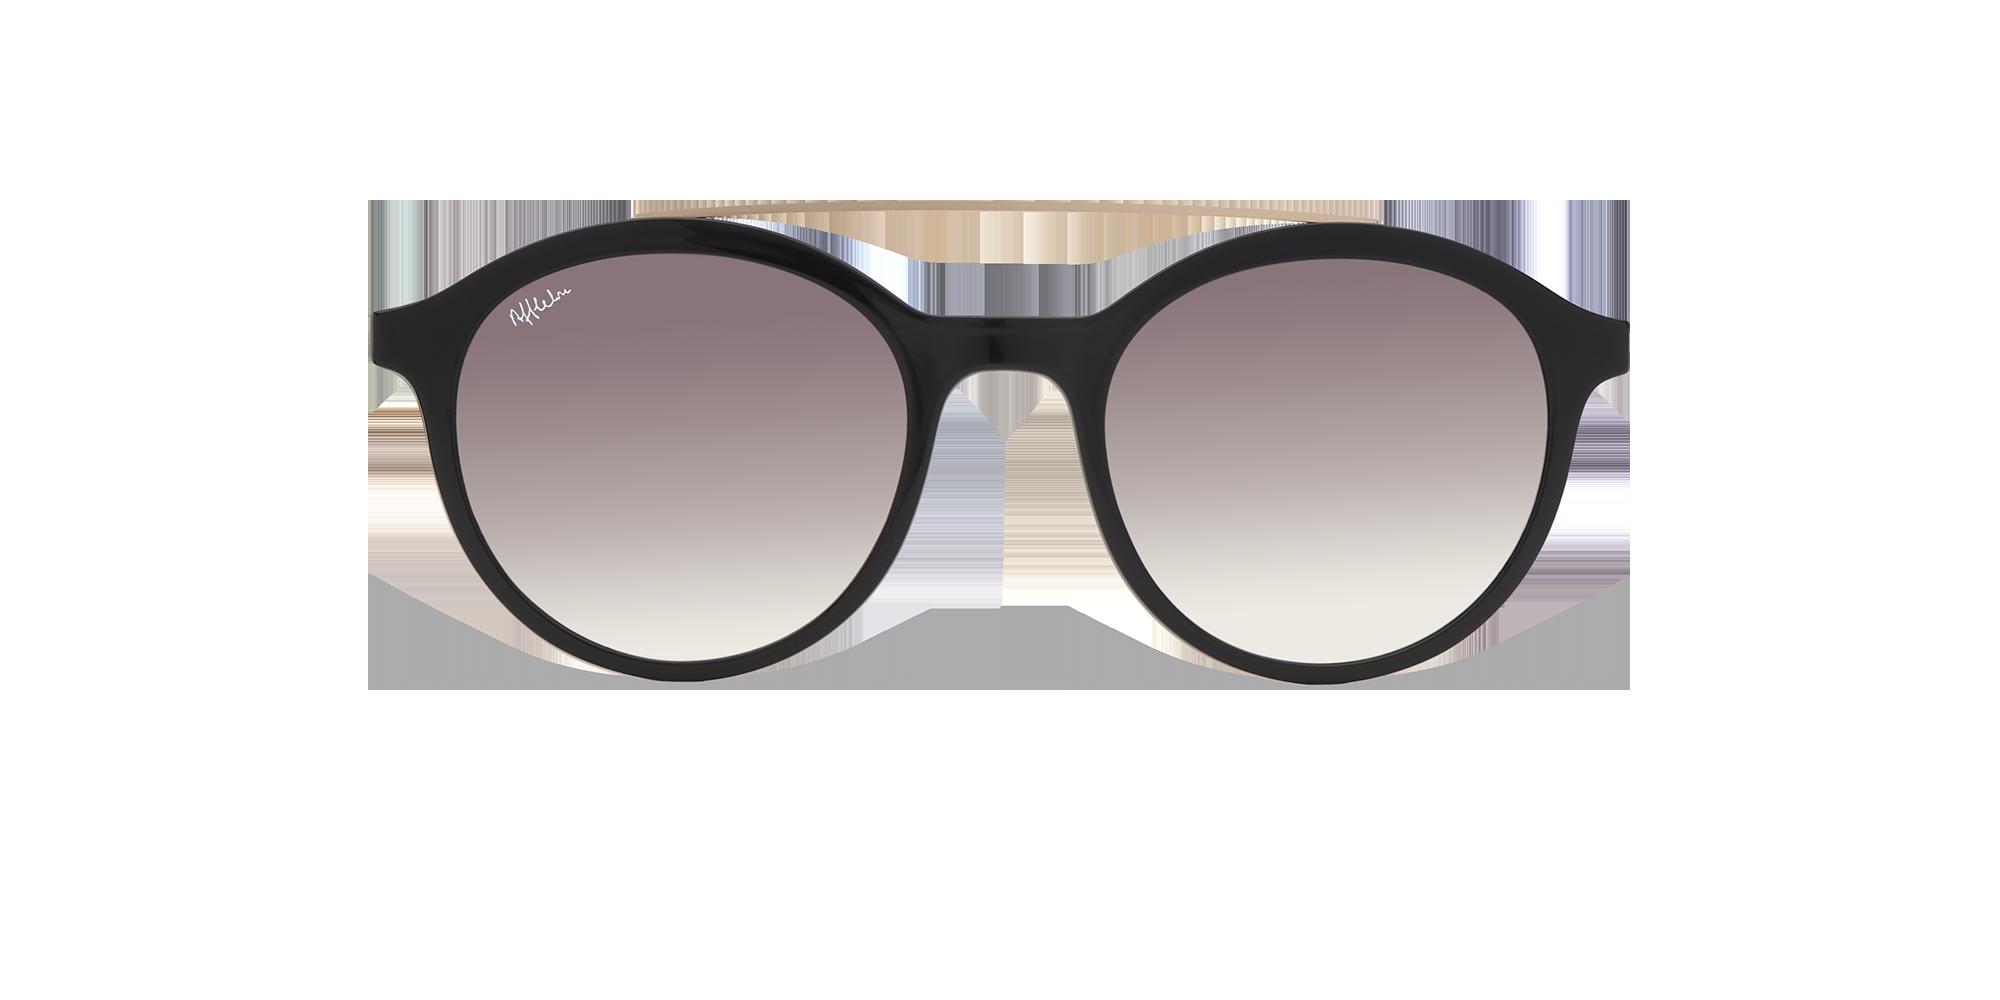 afflelou/france/products/smart_clip/clips_glasses/TMK37TBBK014919.png